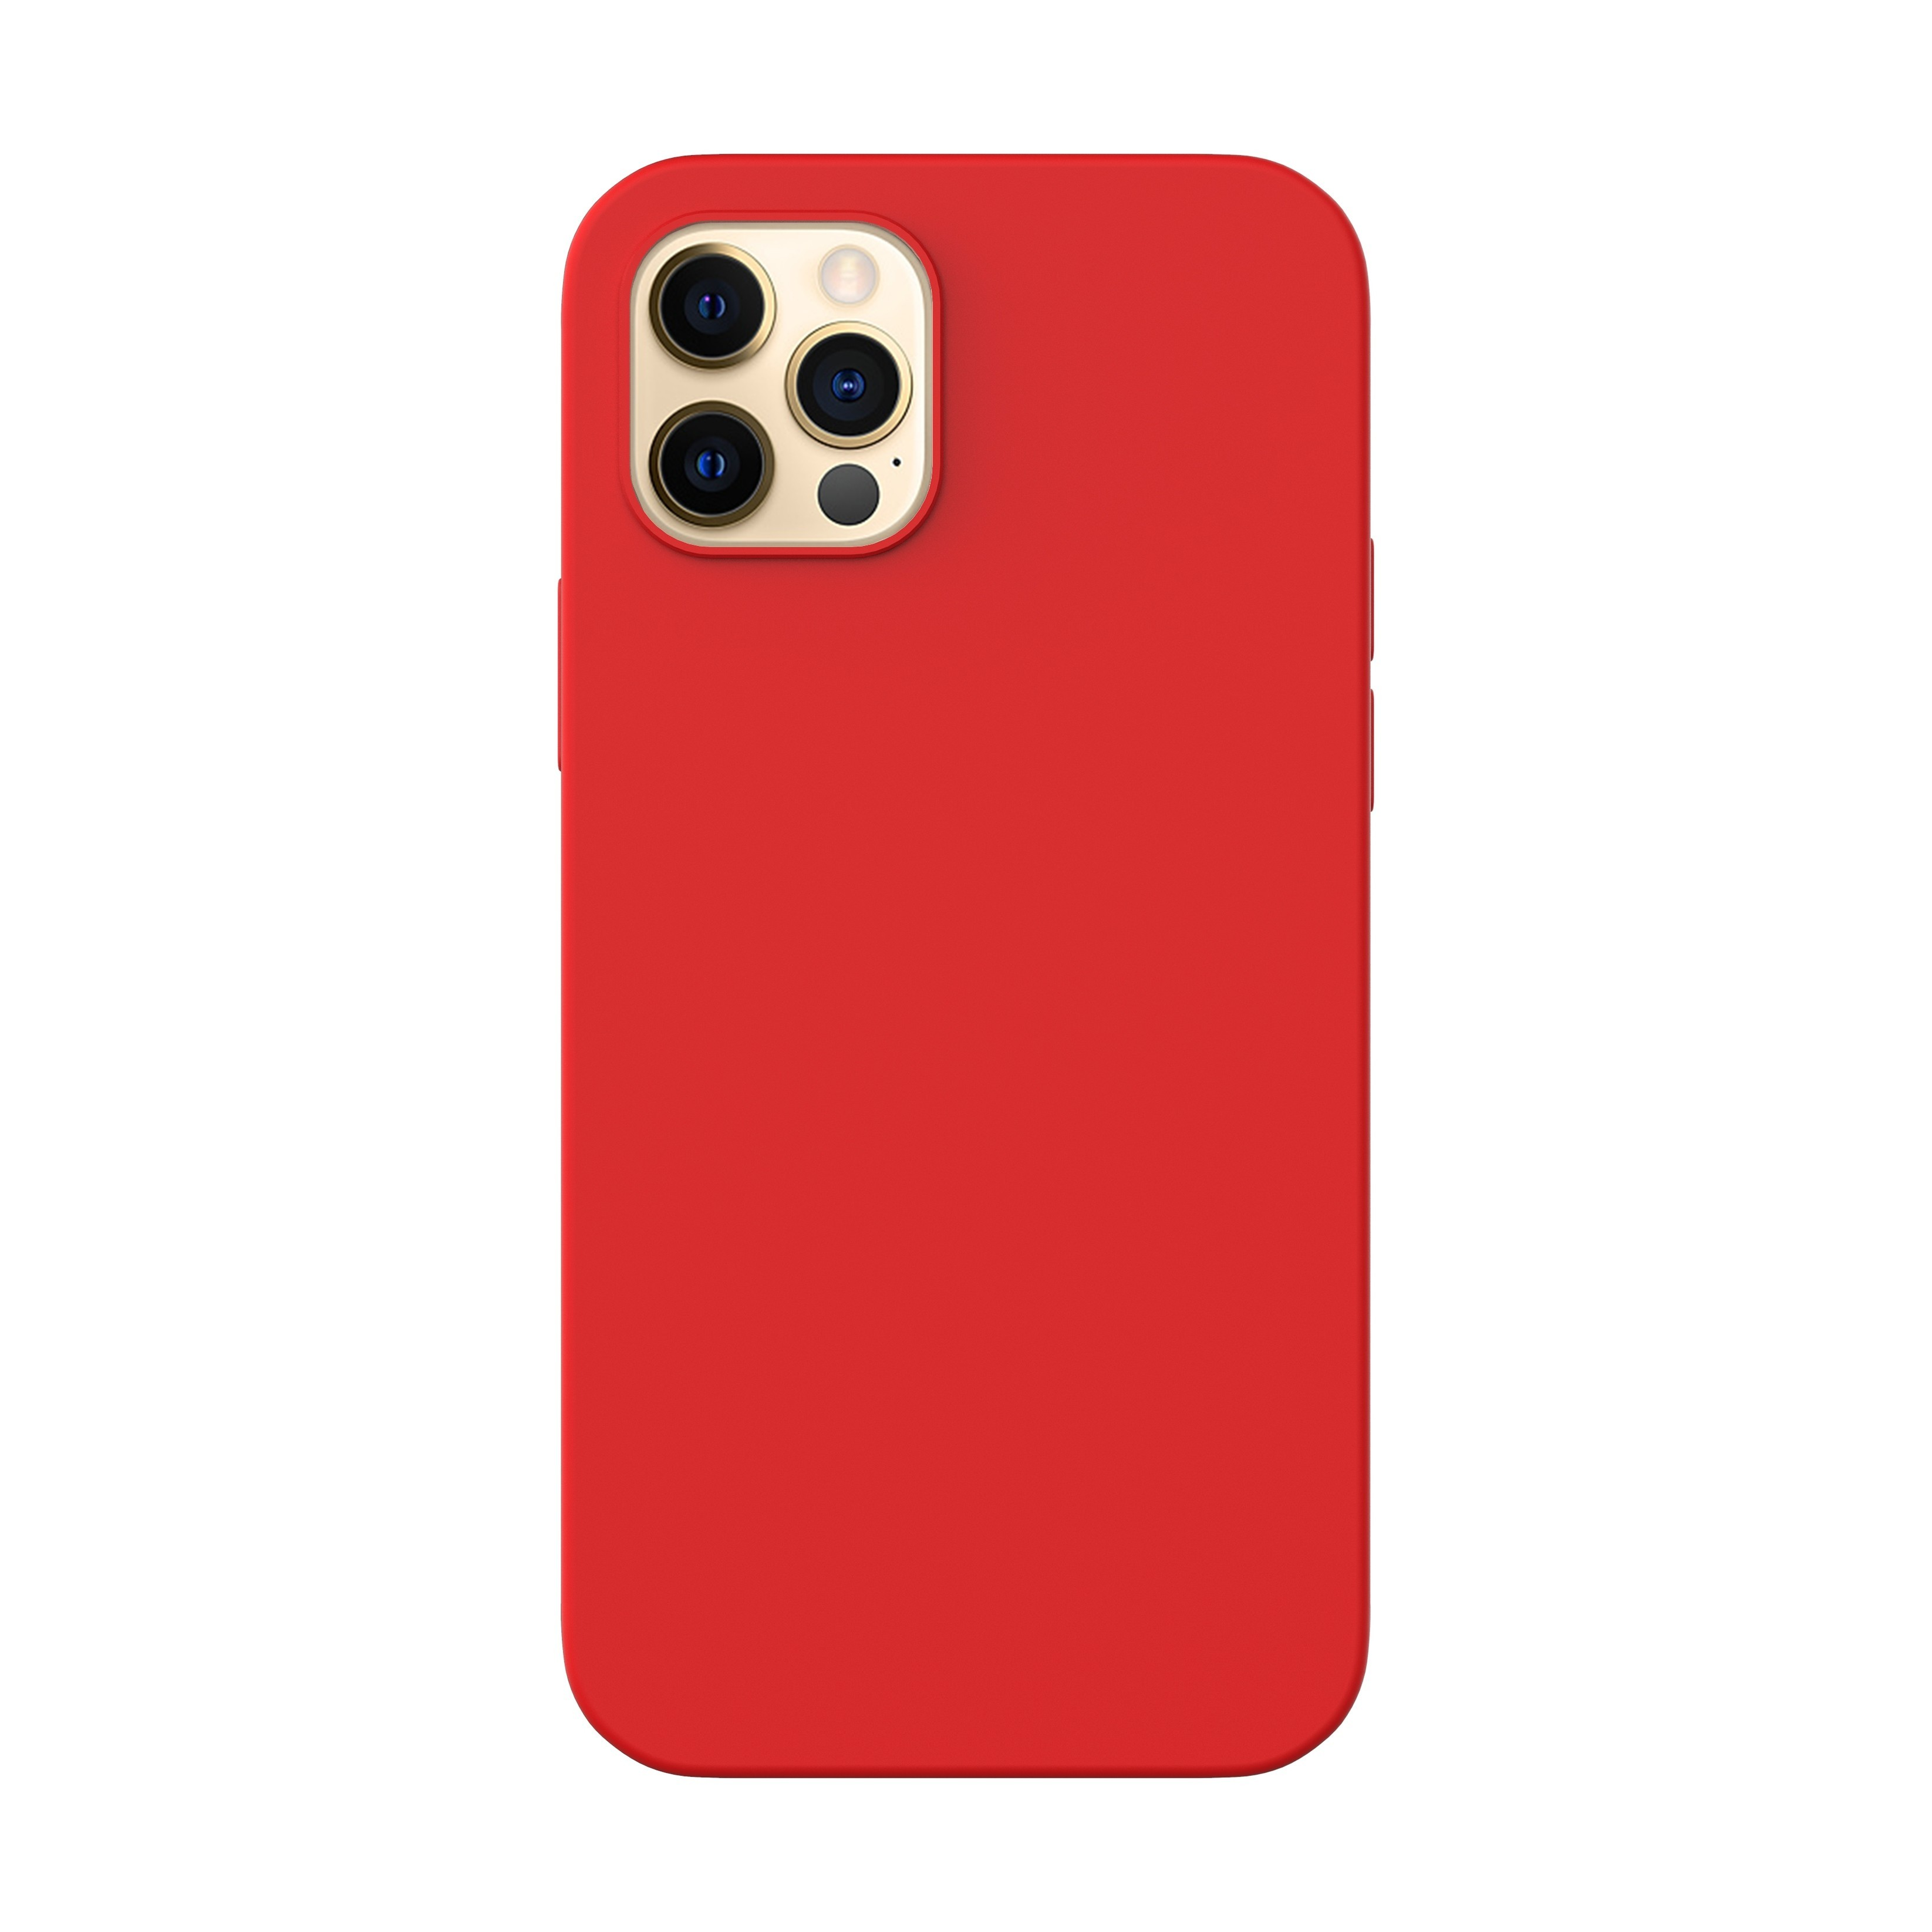 Capac protectie spate cellara din silicon colectia slim pentru iphone 12 pro max - rosu